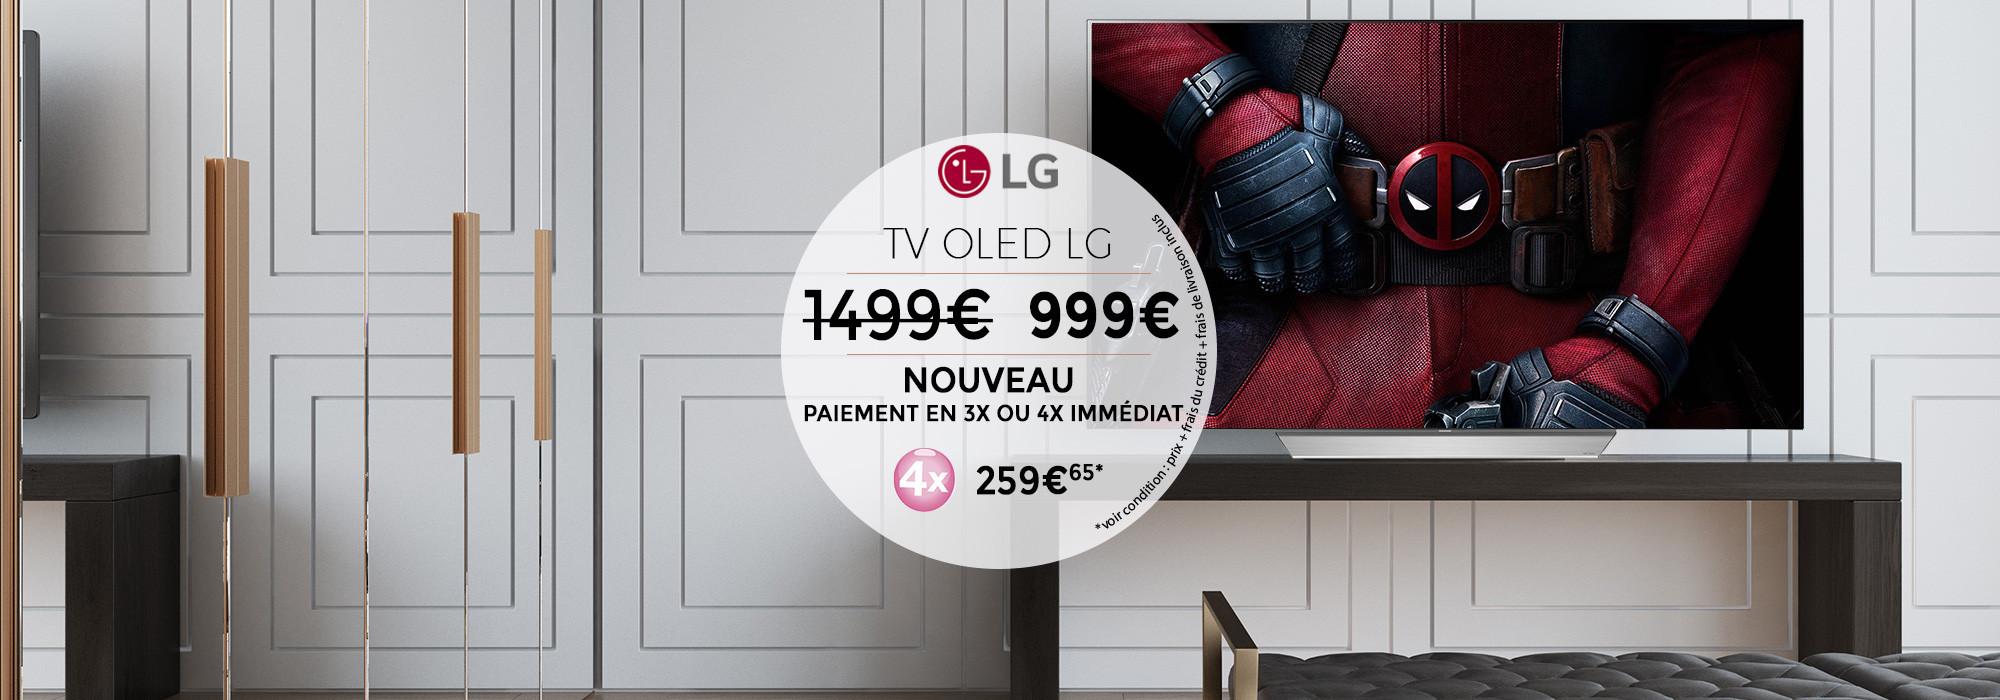 LG OLED TV vs SAMSUNG QLED